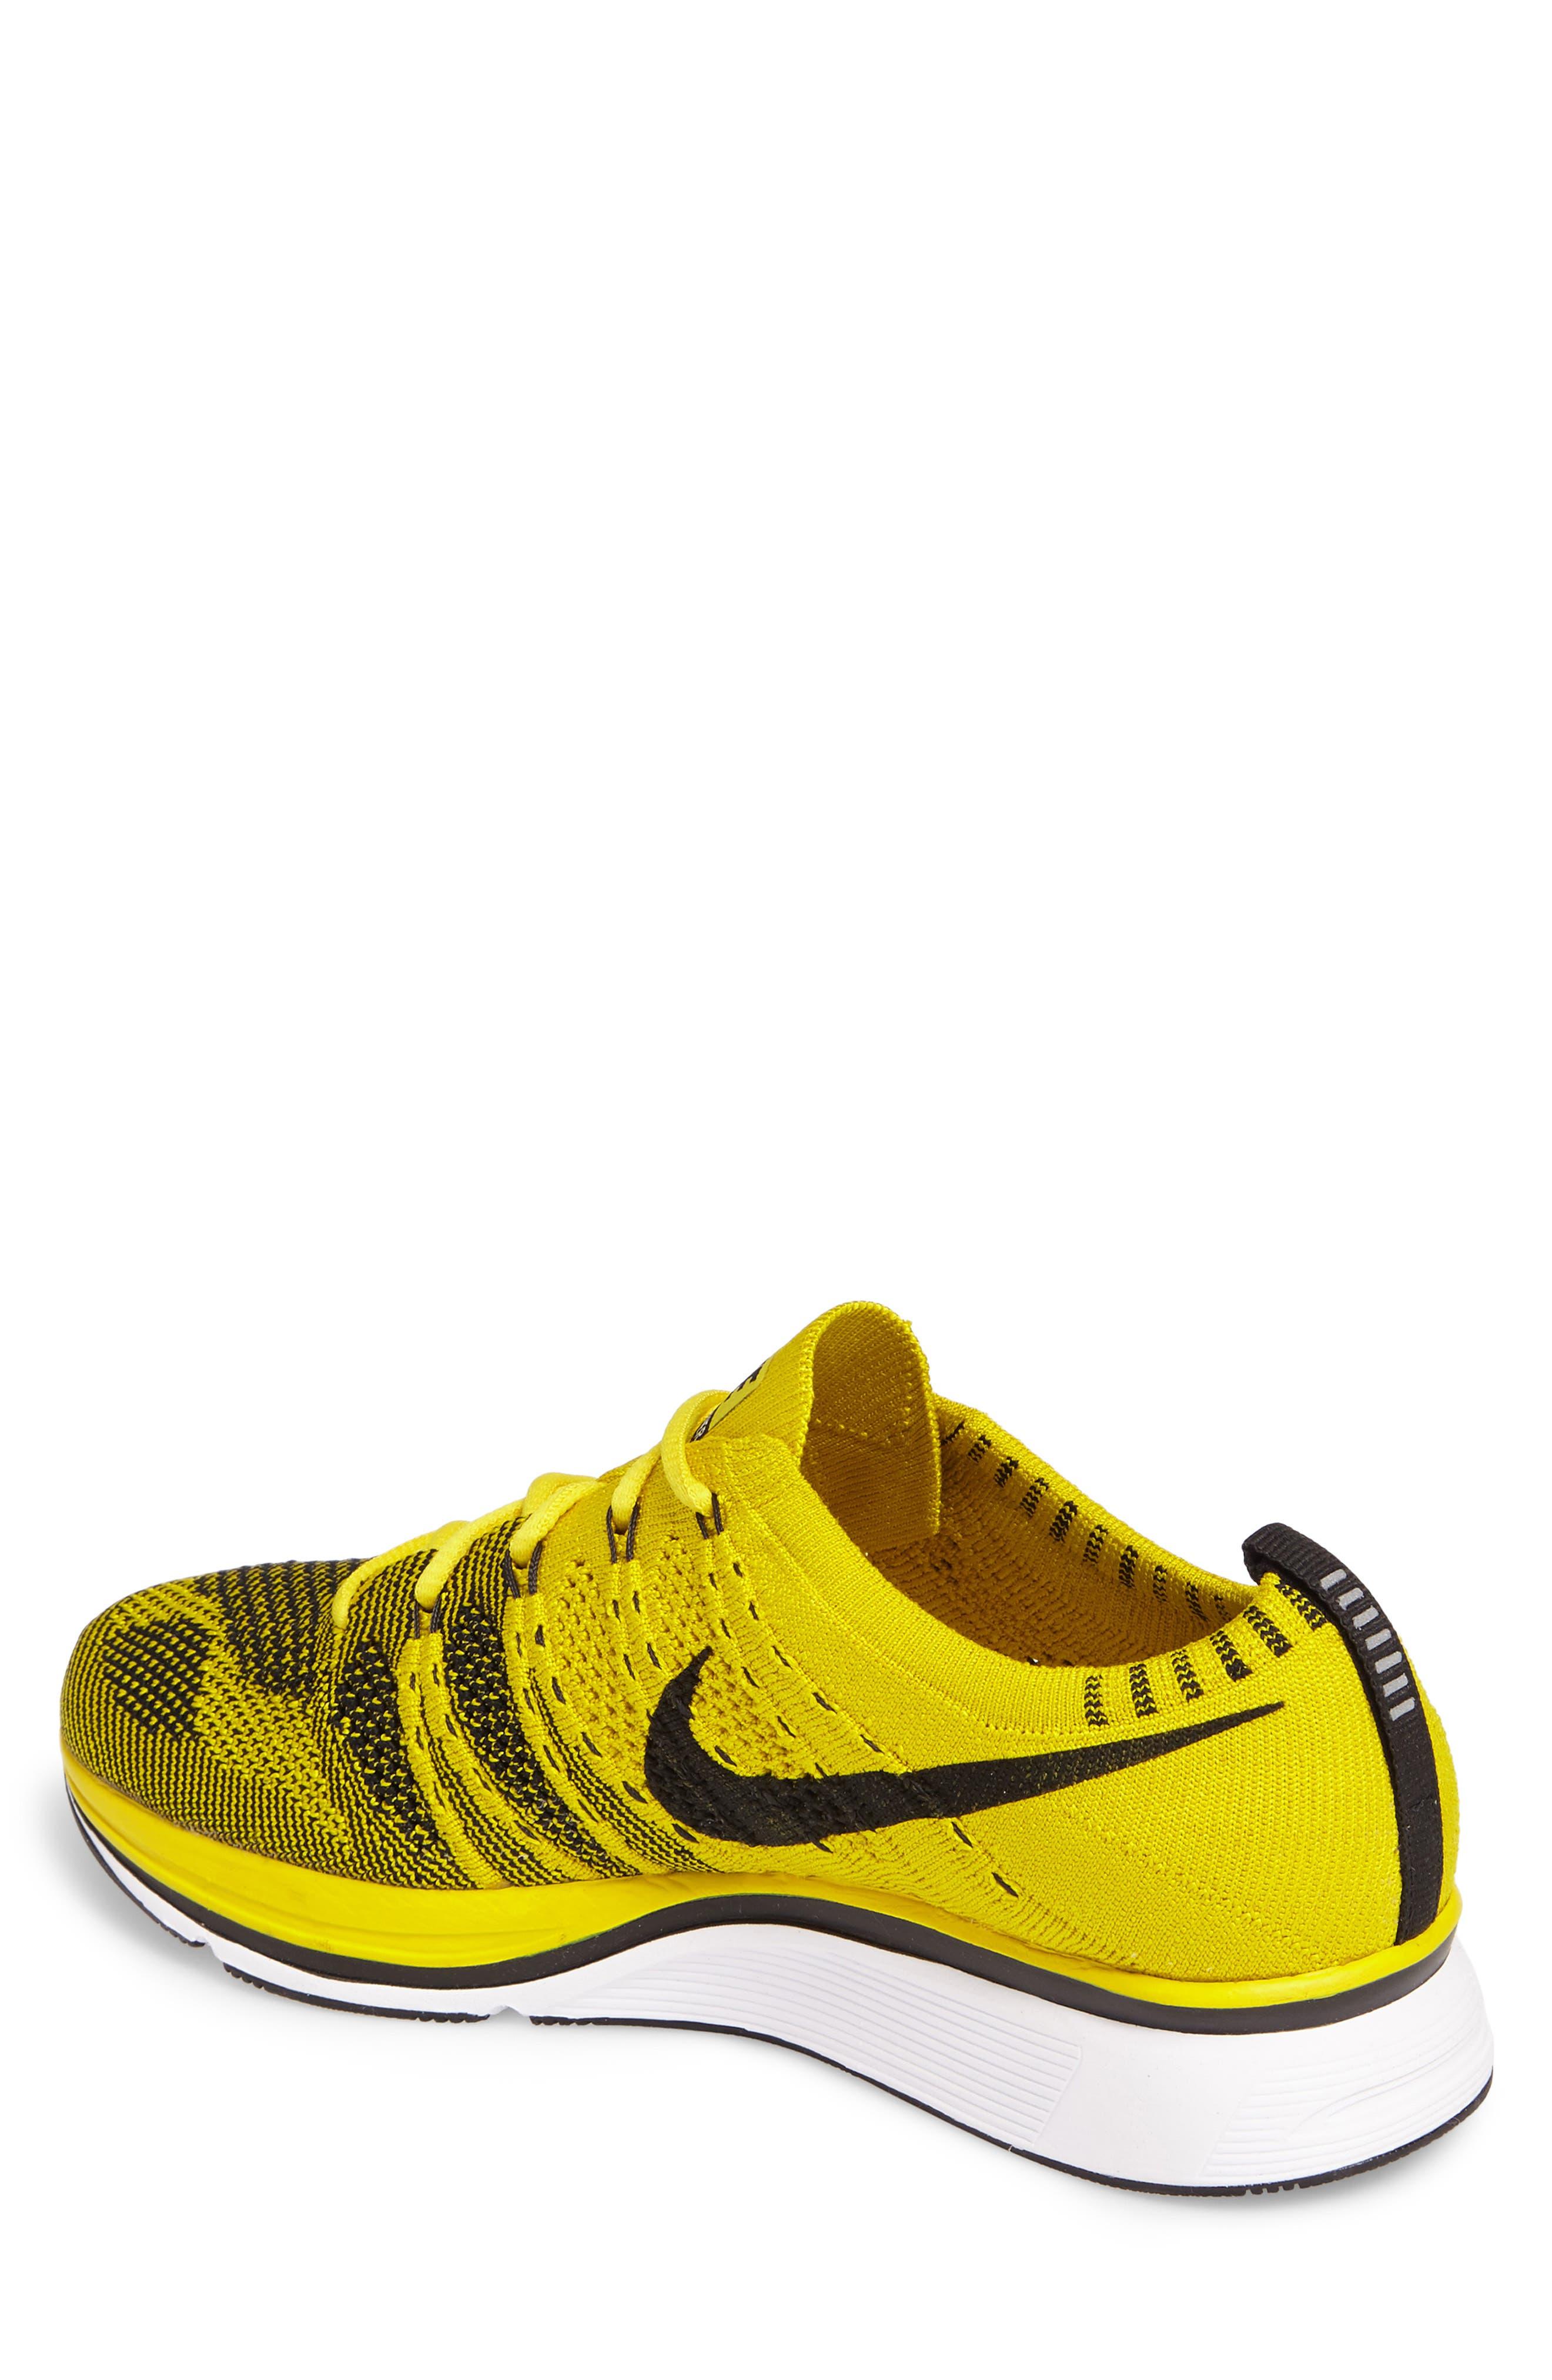 NikeLab Flyknit Trainer Sneaker,                             Alternate thumbnail 2, color,                             Bright Citron/ Black/ White